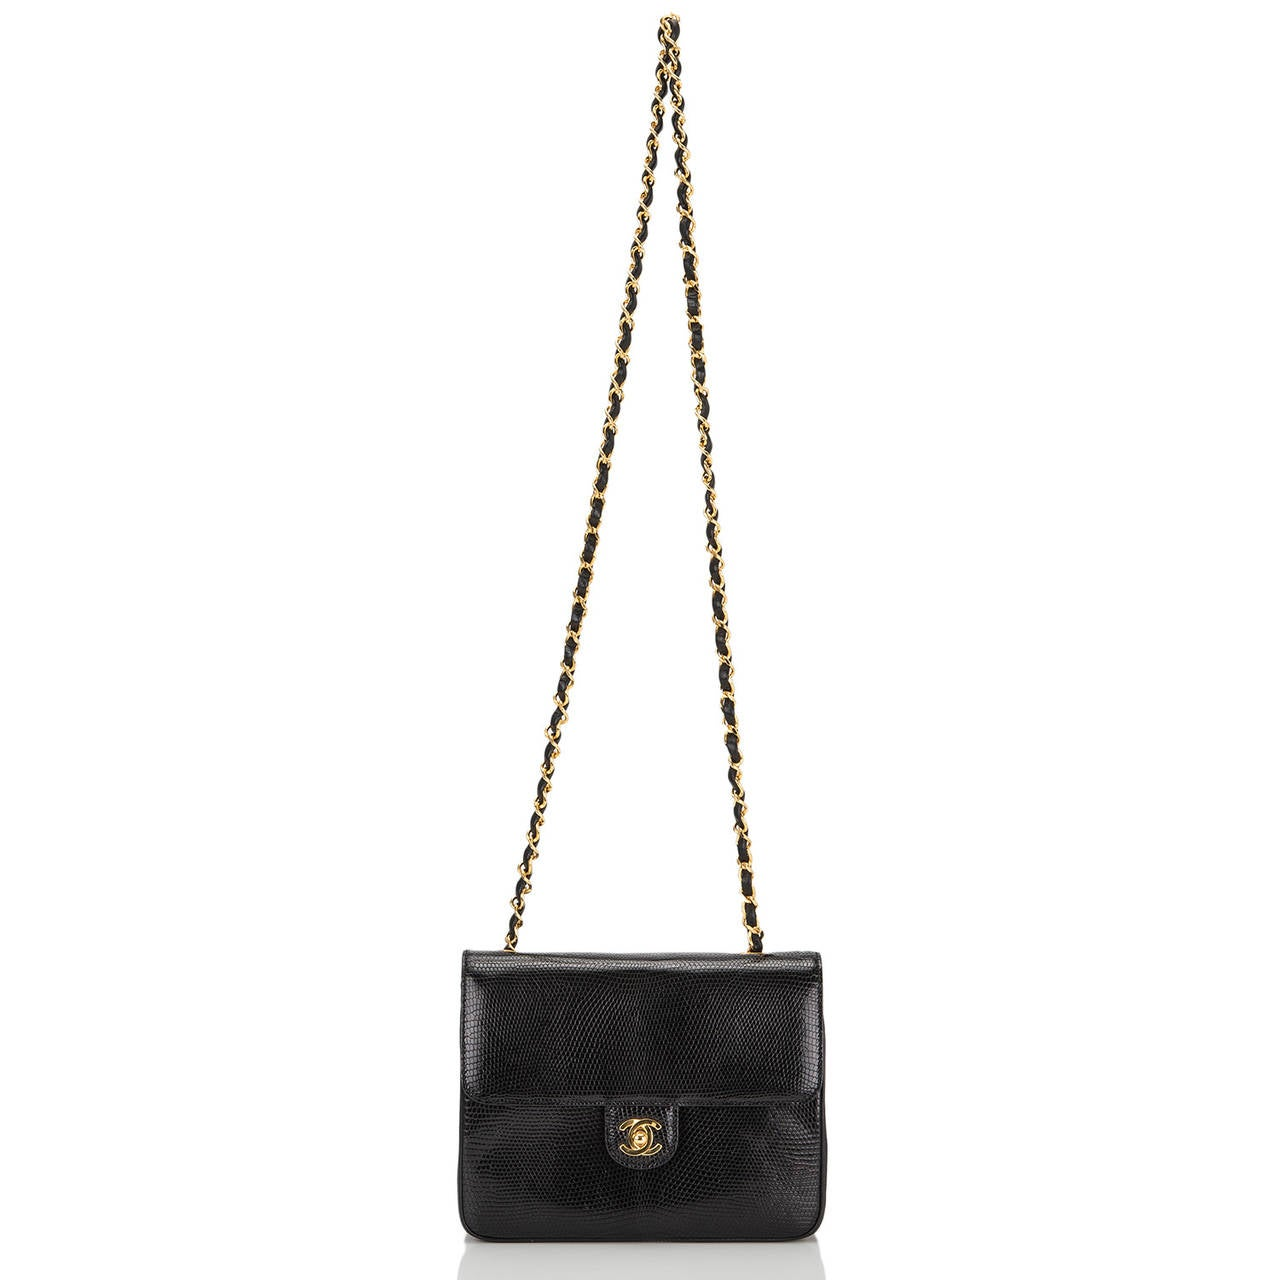 Chanel Vintage Black Lizard Large Mini Flap Bag For Sale 1